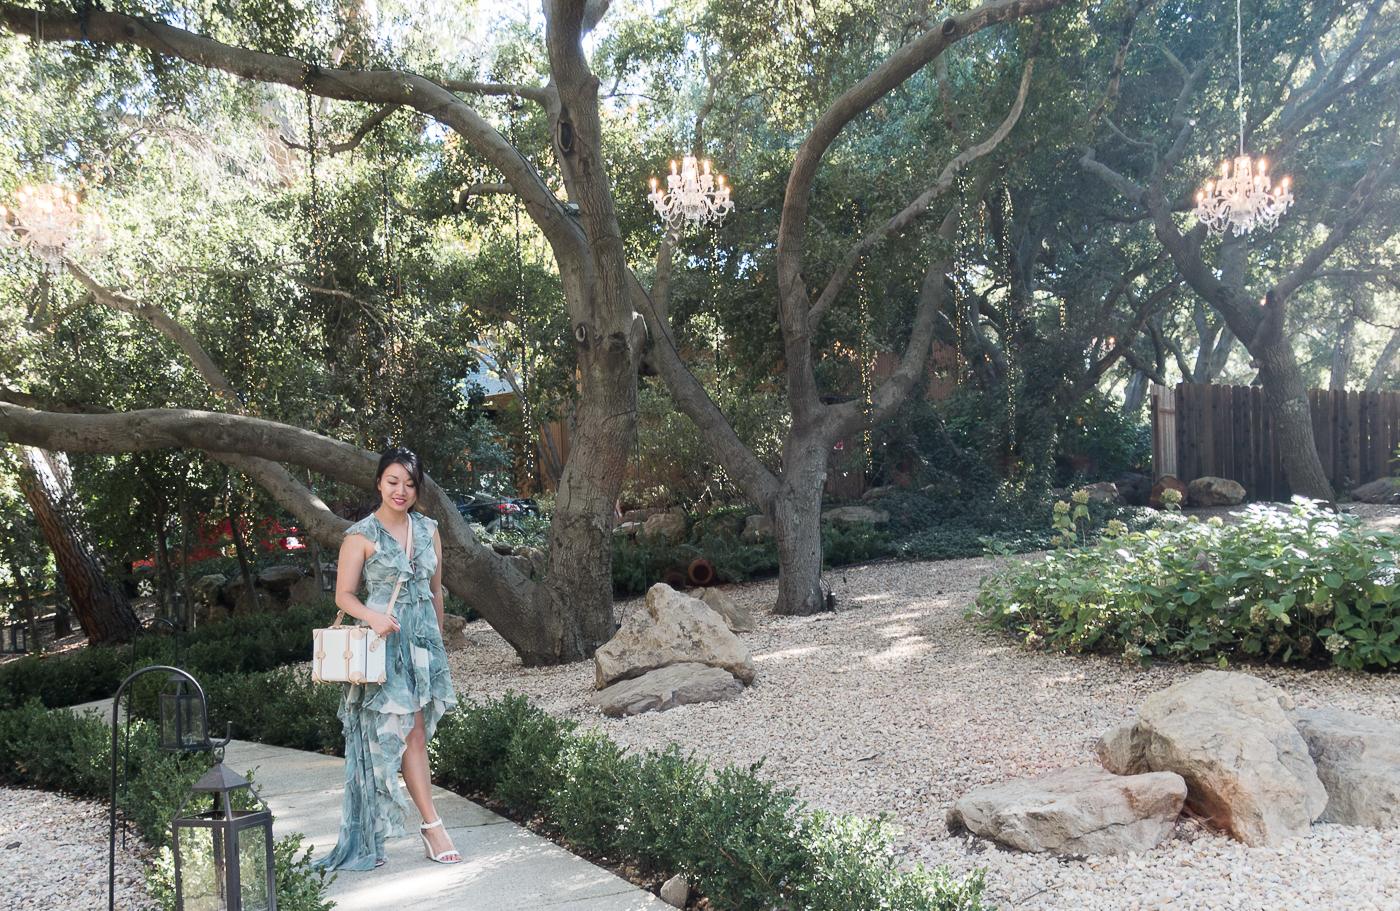 Calamigos Ranch Malibu Wedding - Lulu's Sage Green High-Low Dress | The Chic Diary